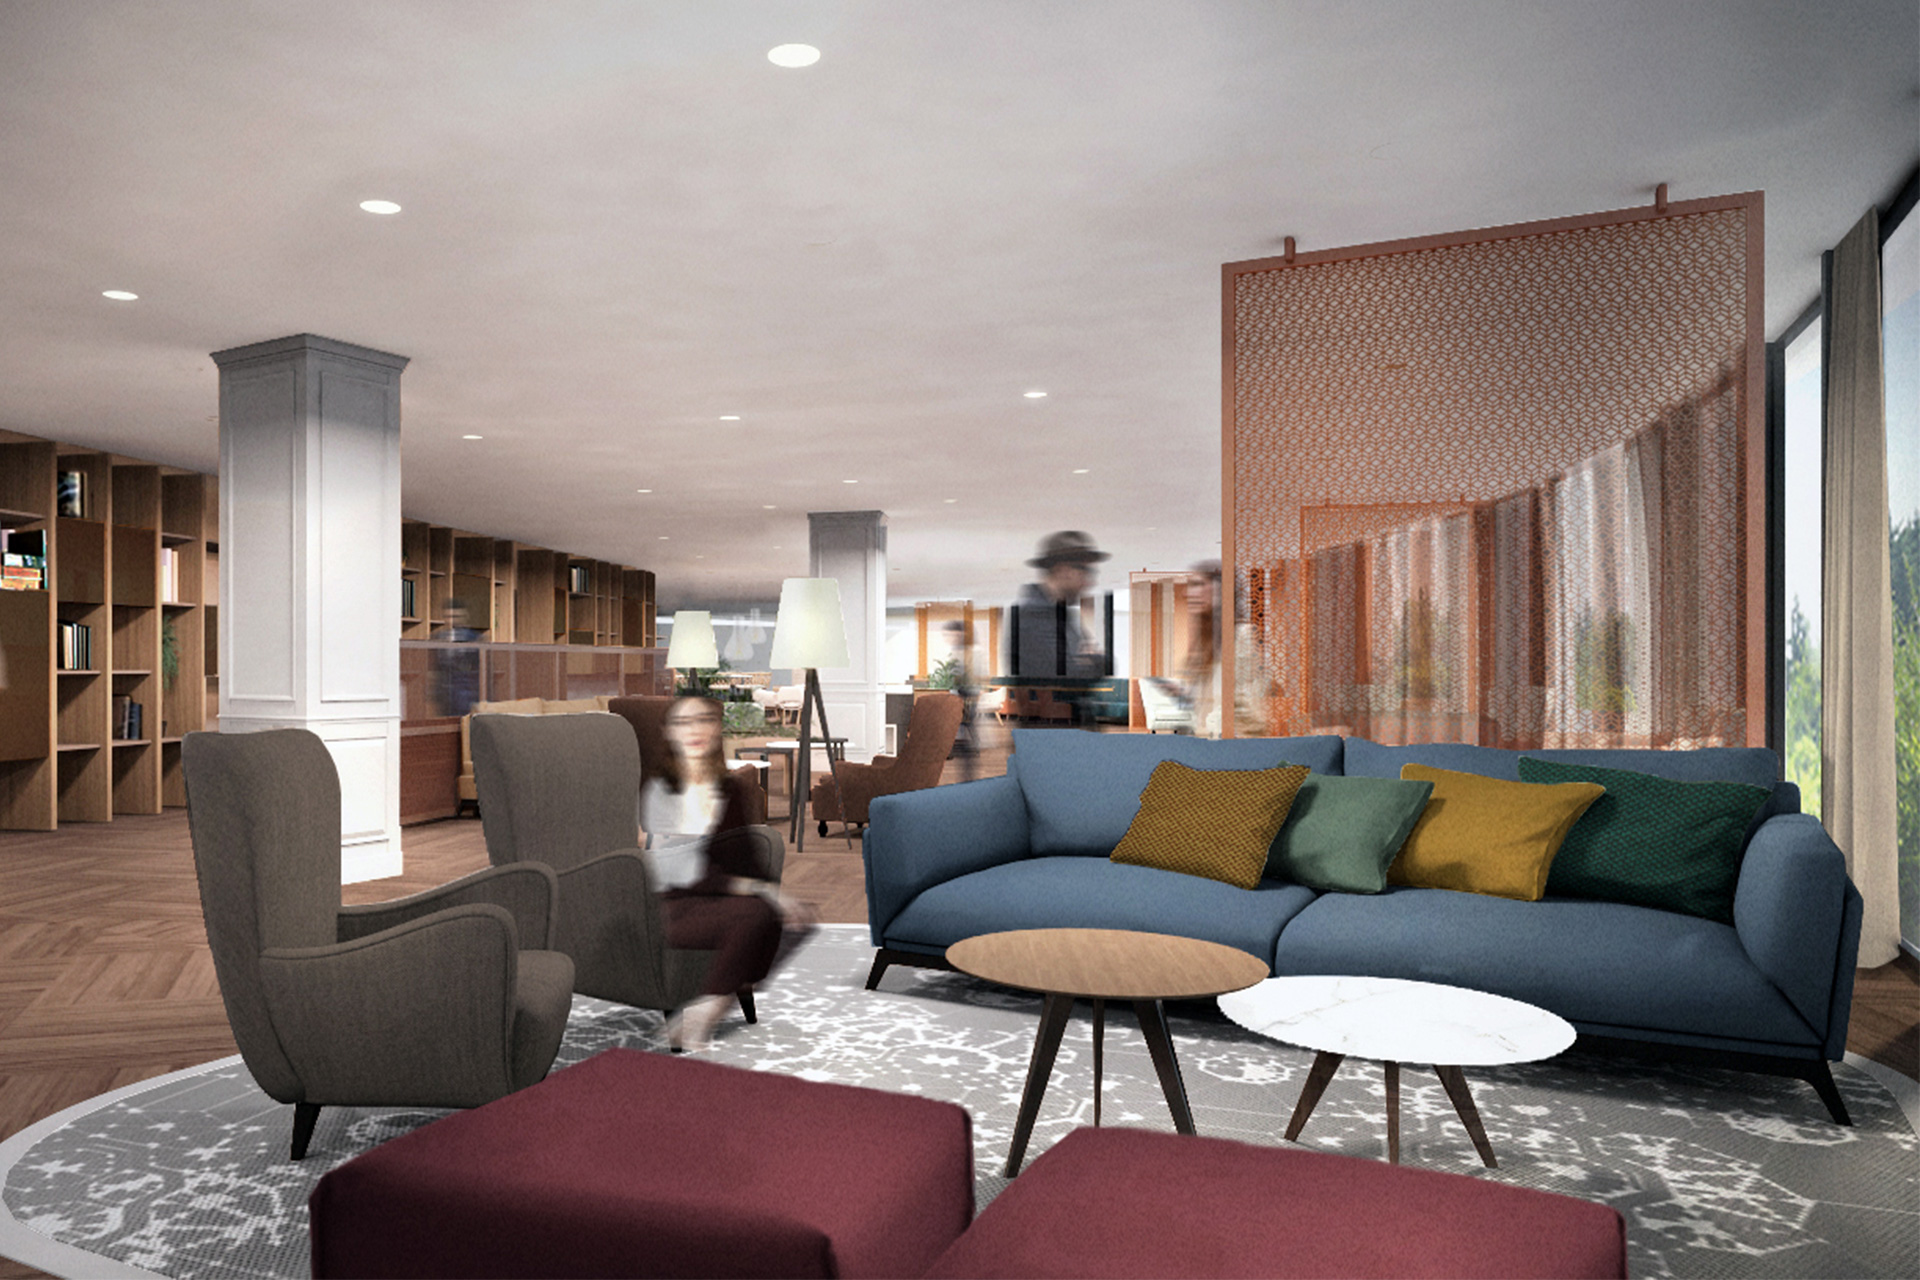 HOTEL SHERATON 37